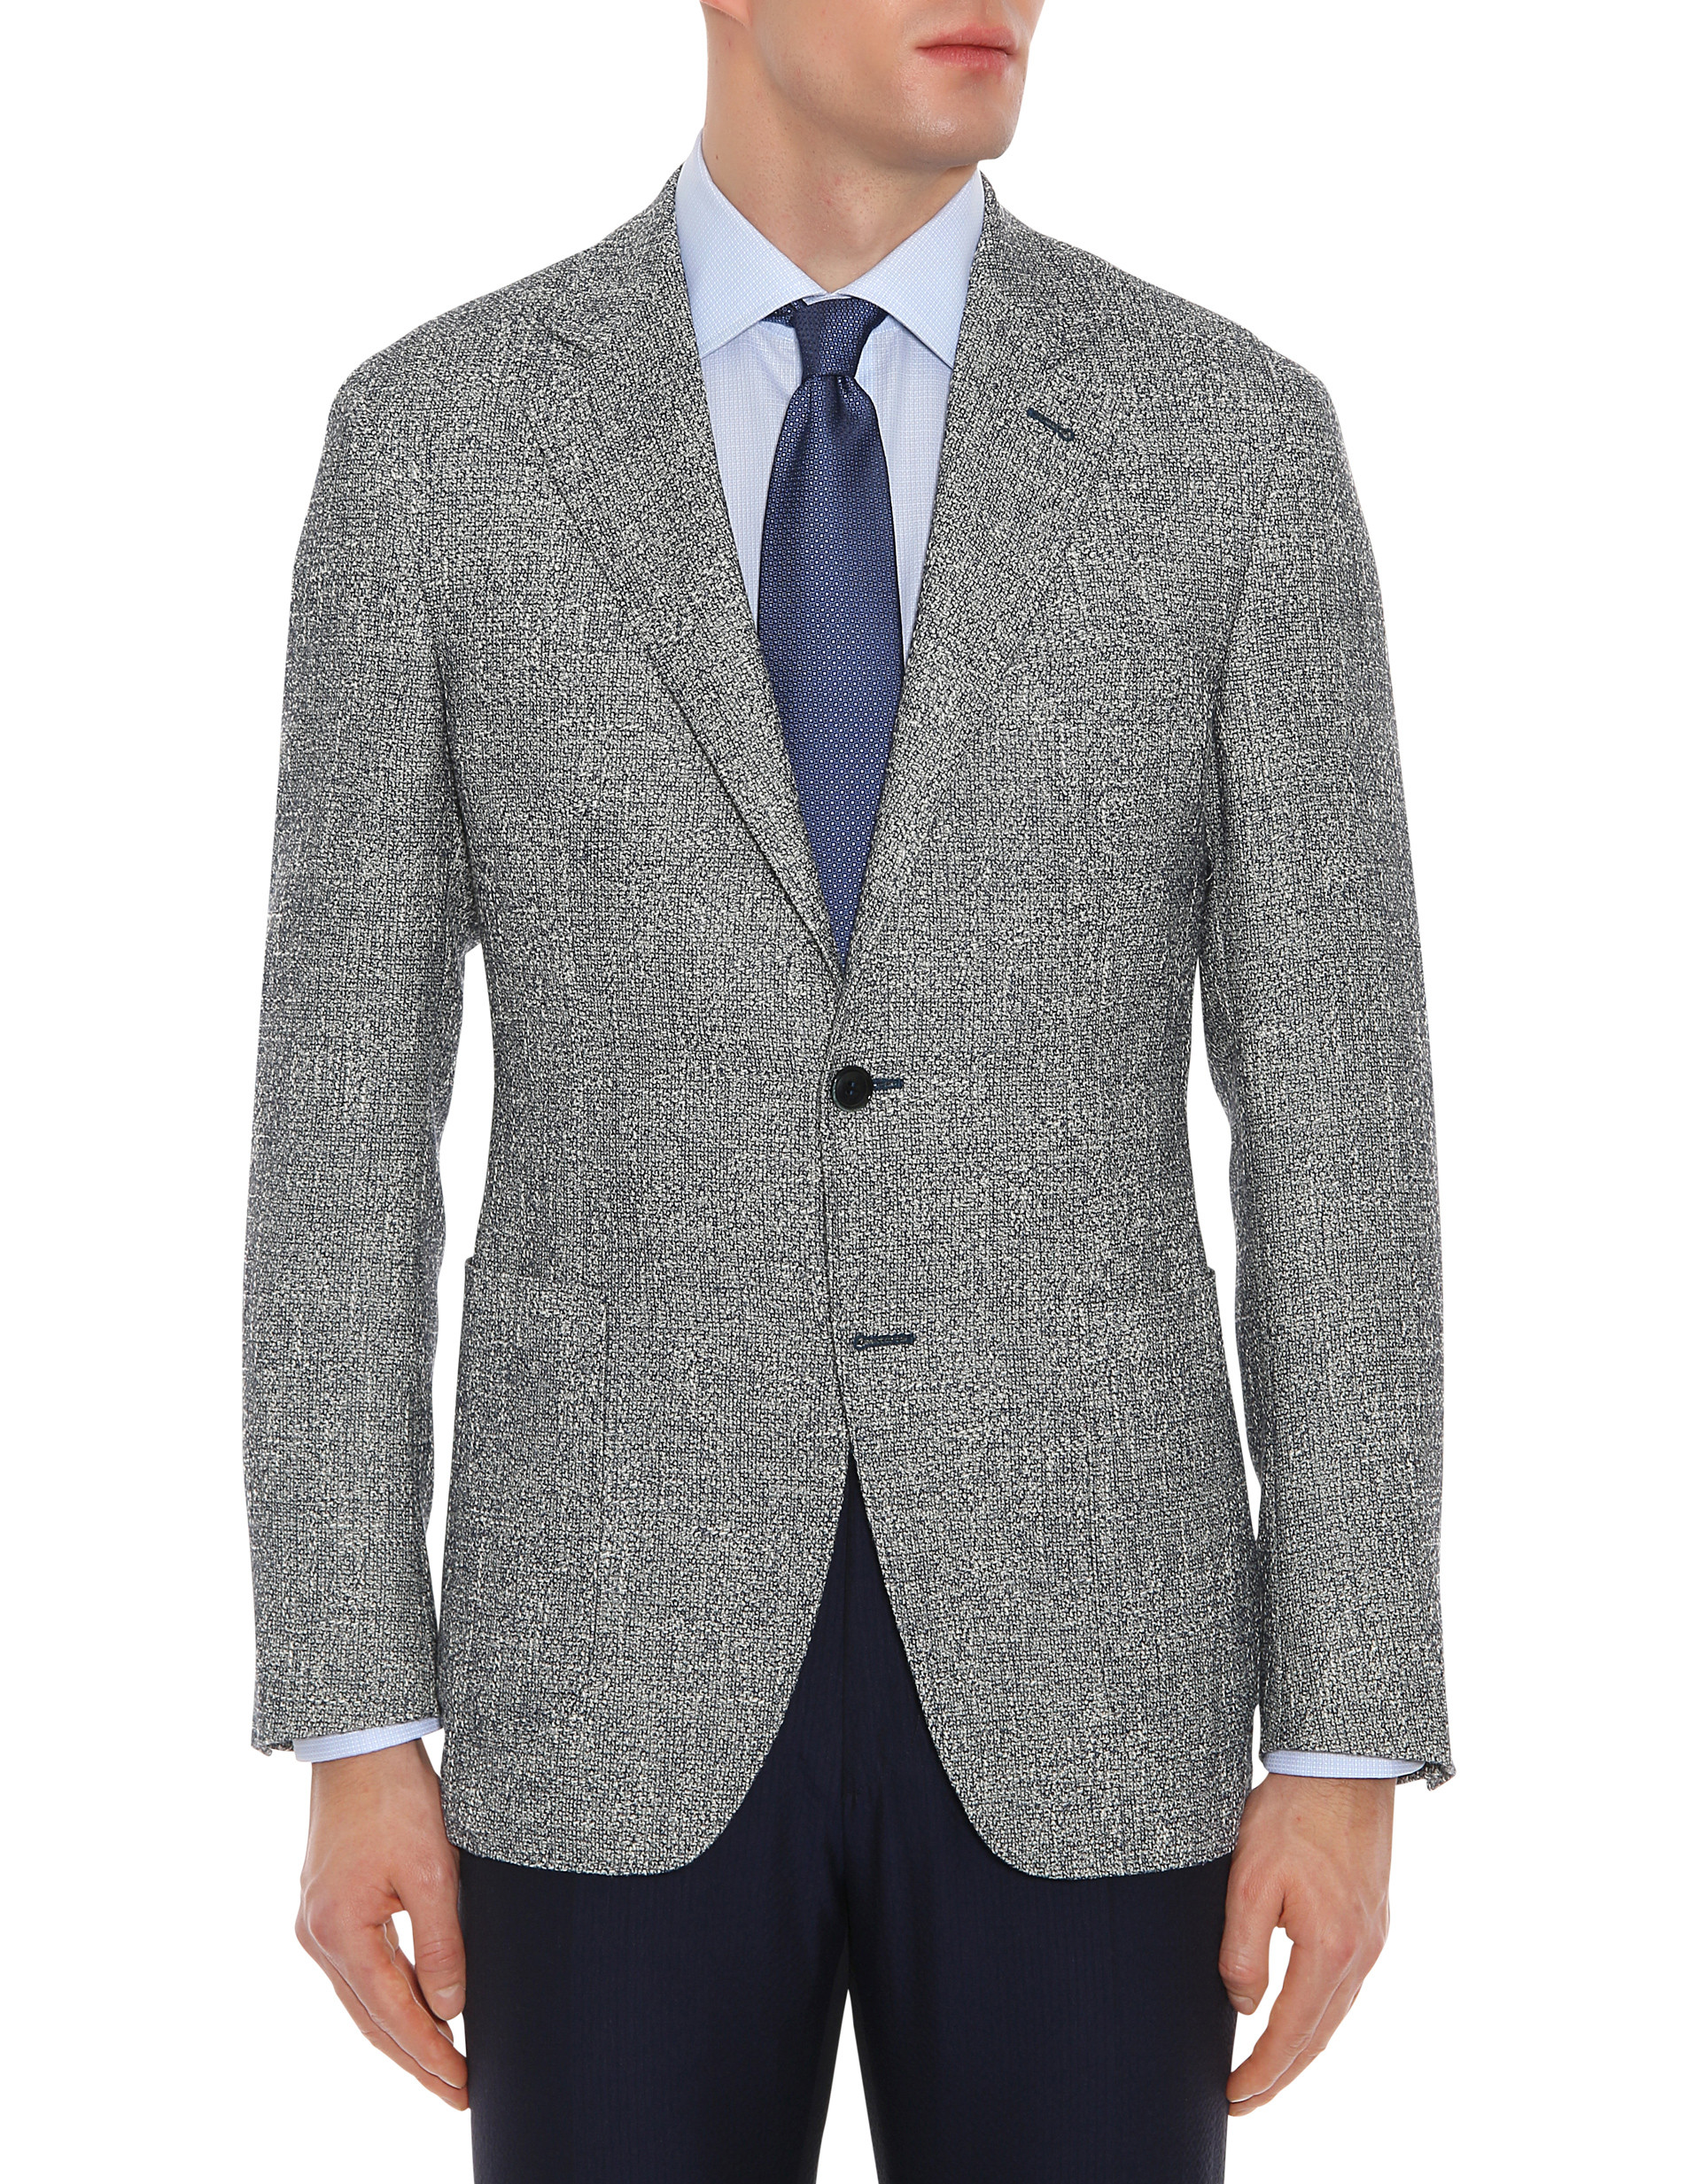 Look 2: Textured Blazer -